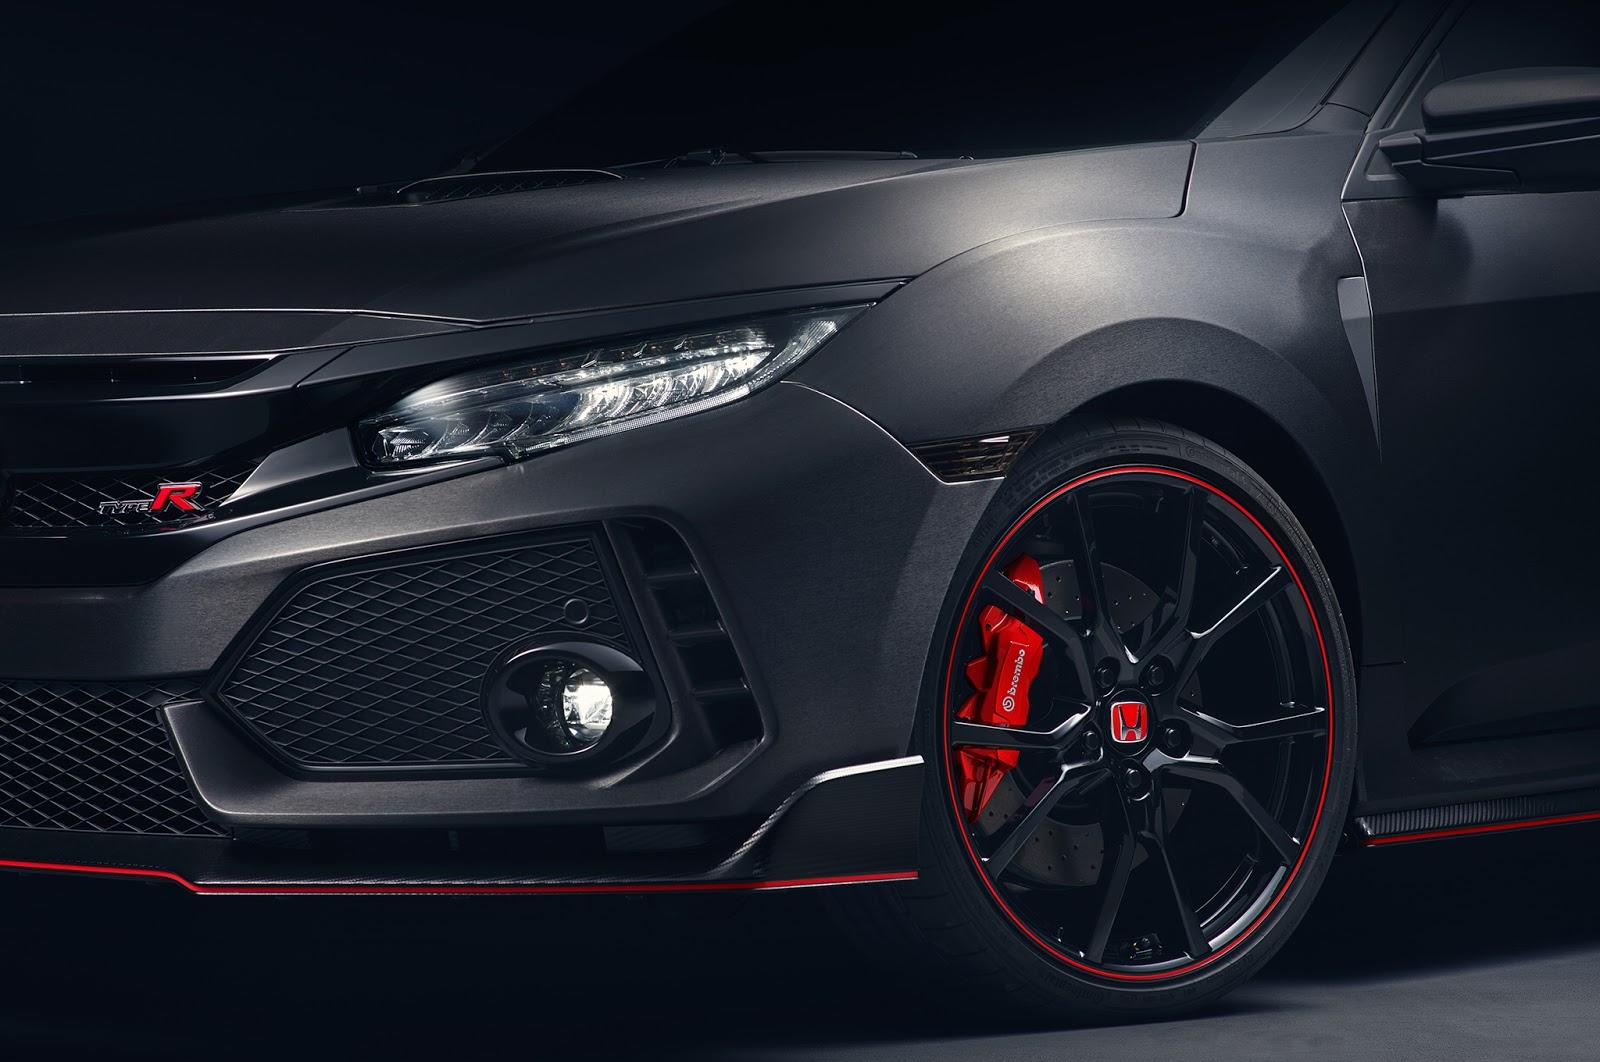 2017 Honda Civic Type R prototype bows in at Paris Motor Show ...